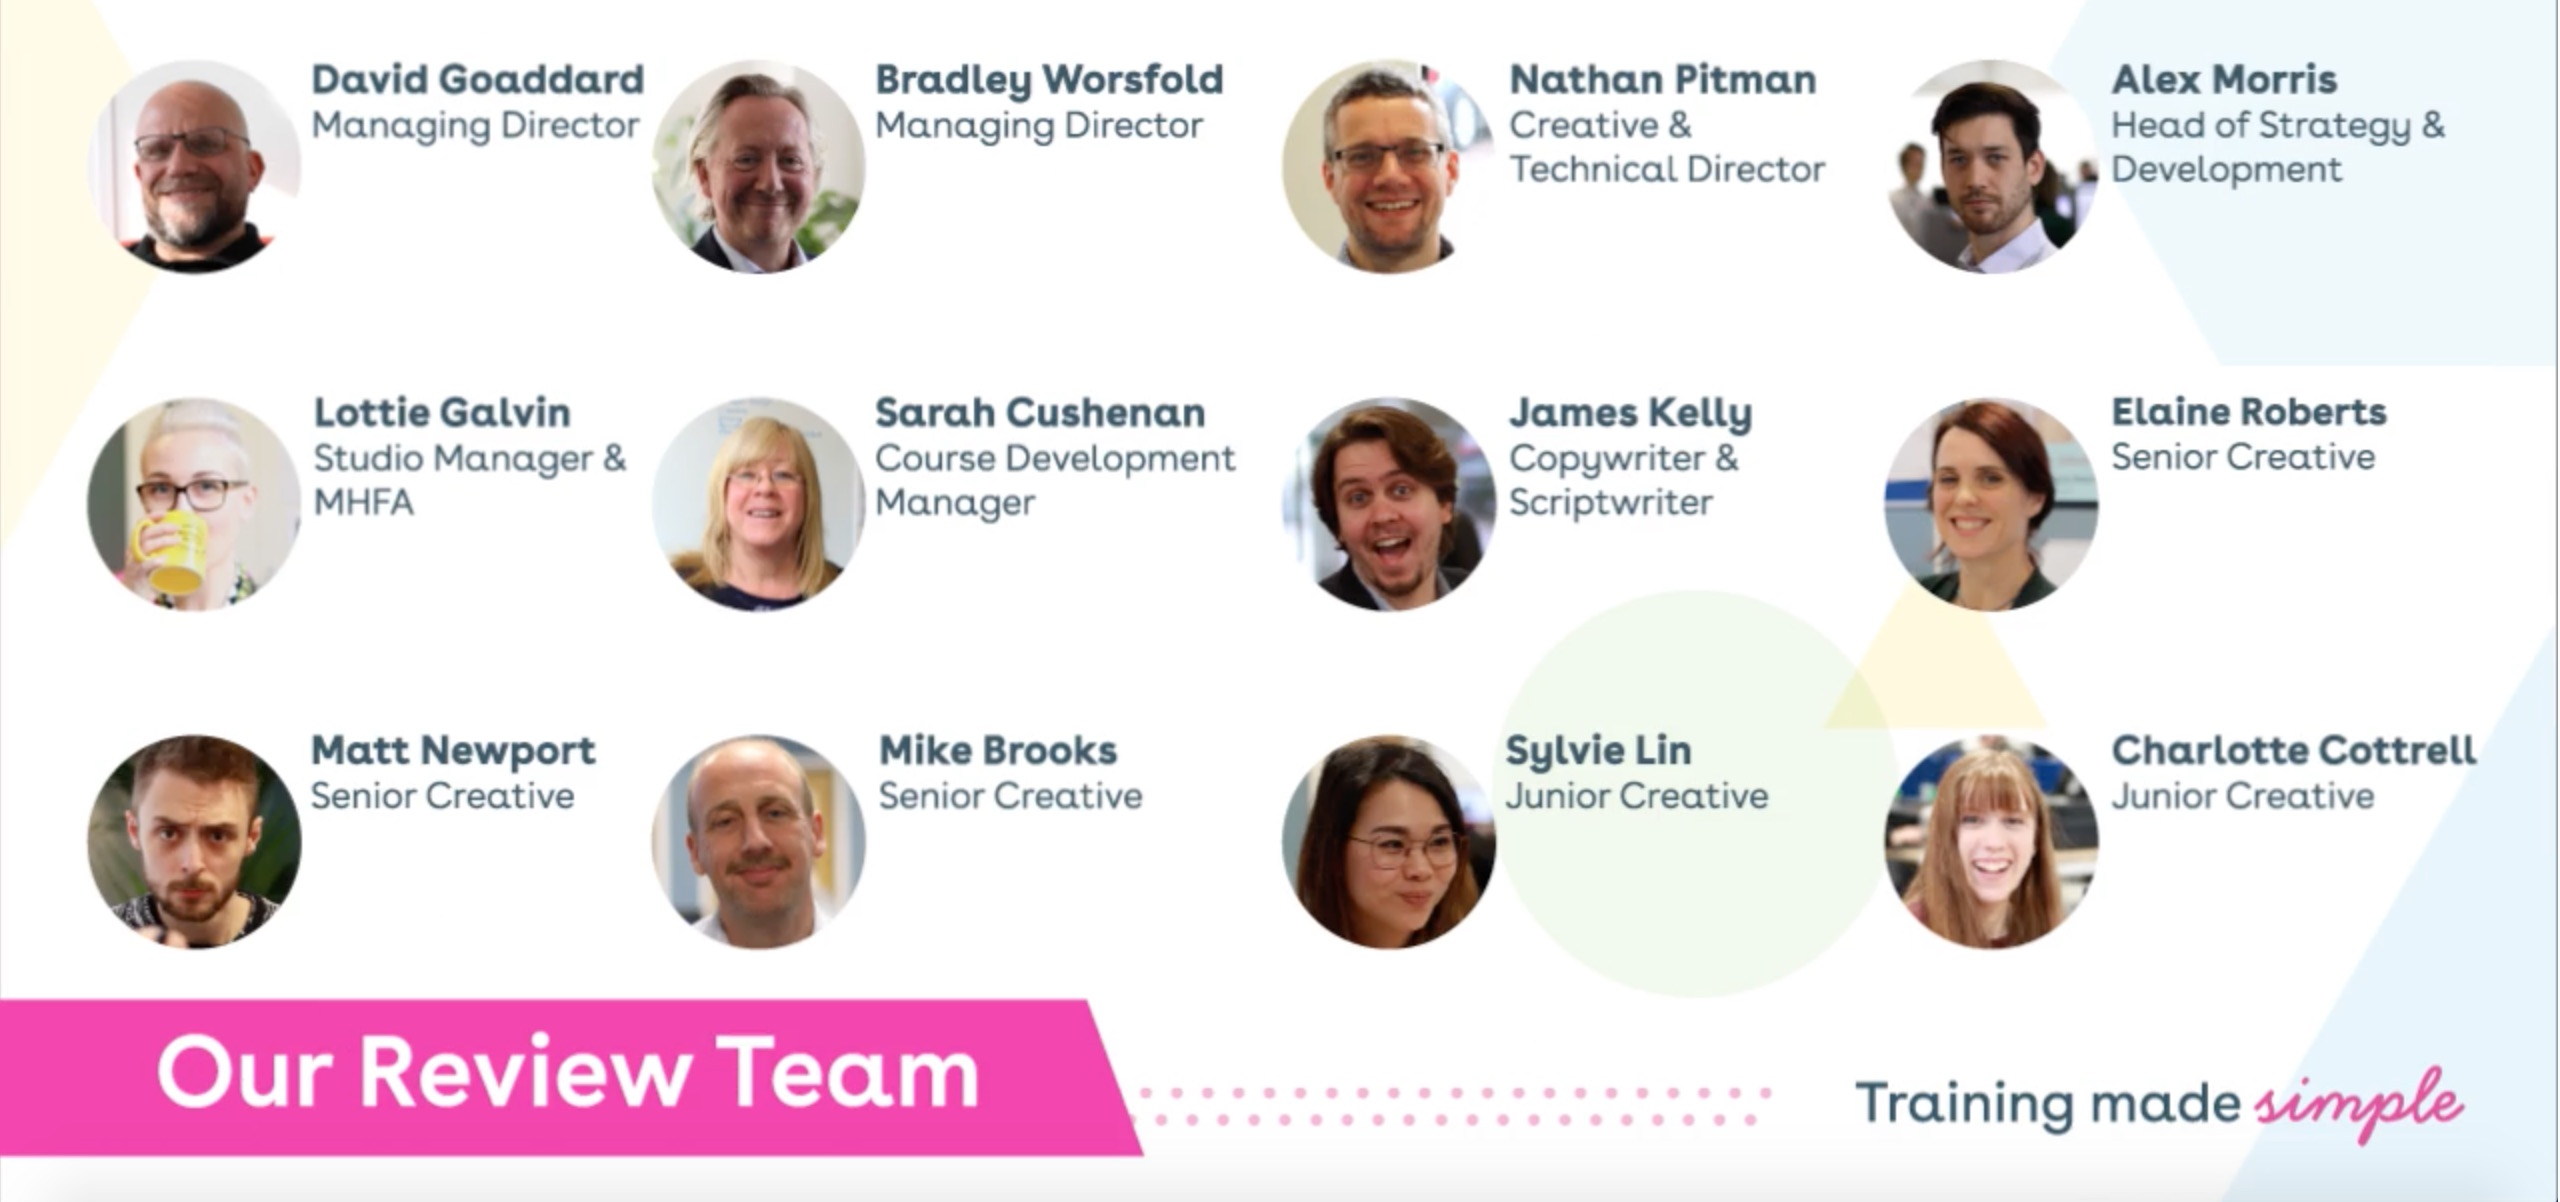 The iHASCO review team